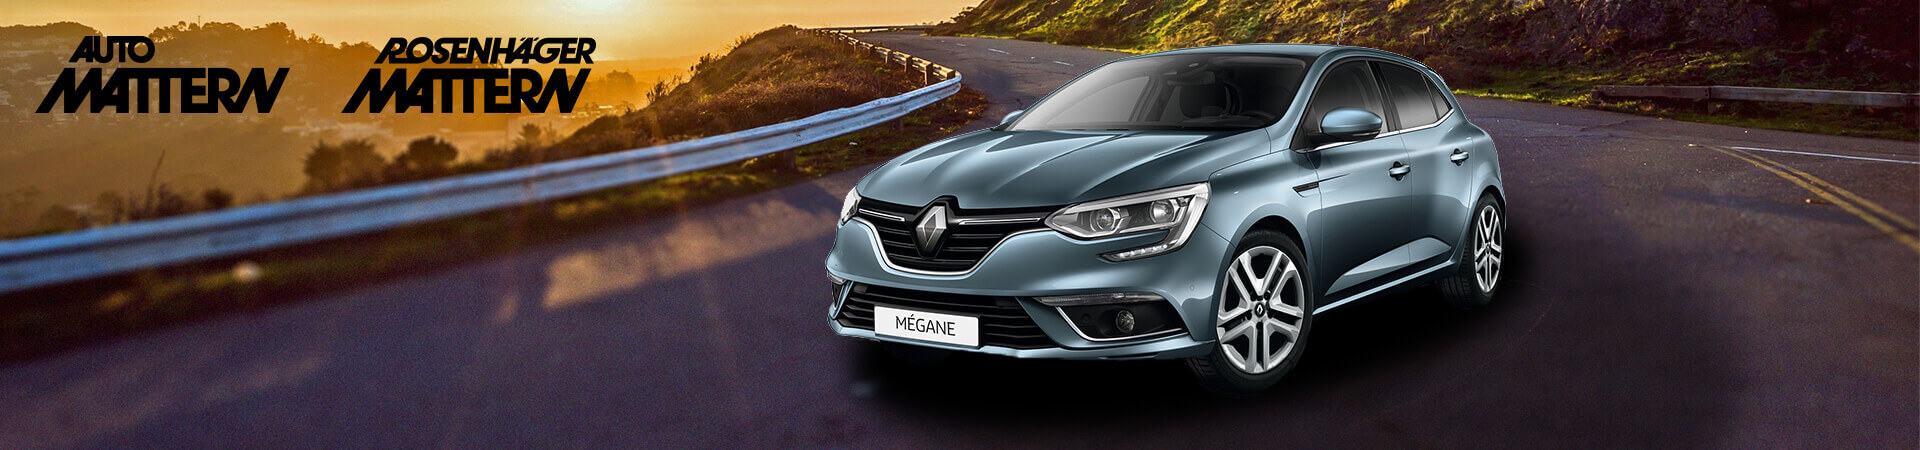 Renault Megane Play